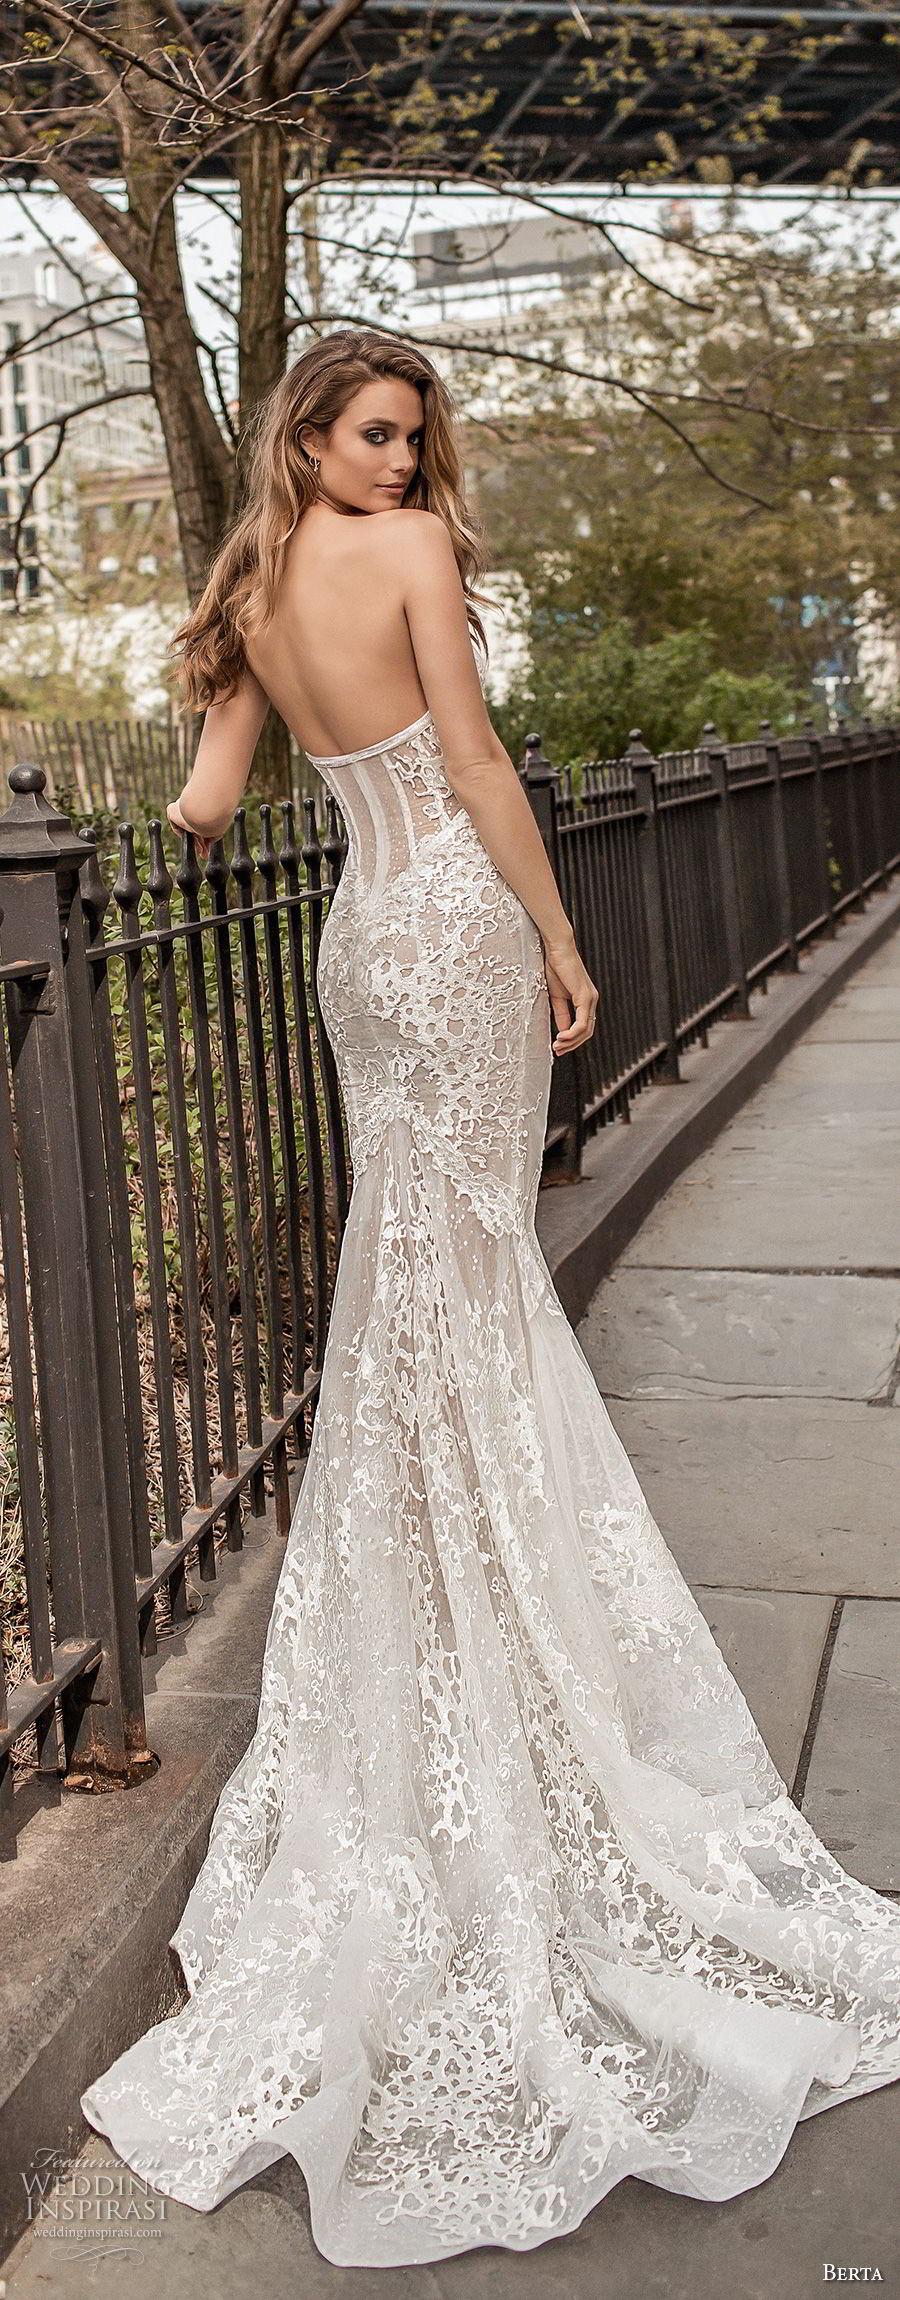 Berta Bridal Spring 2018 Wedding Dresses – Part 2 - crazyforus